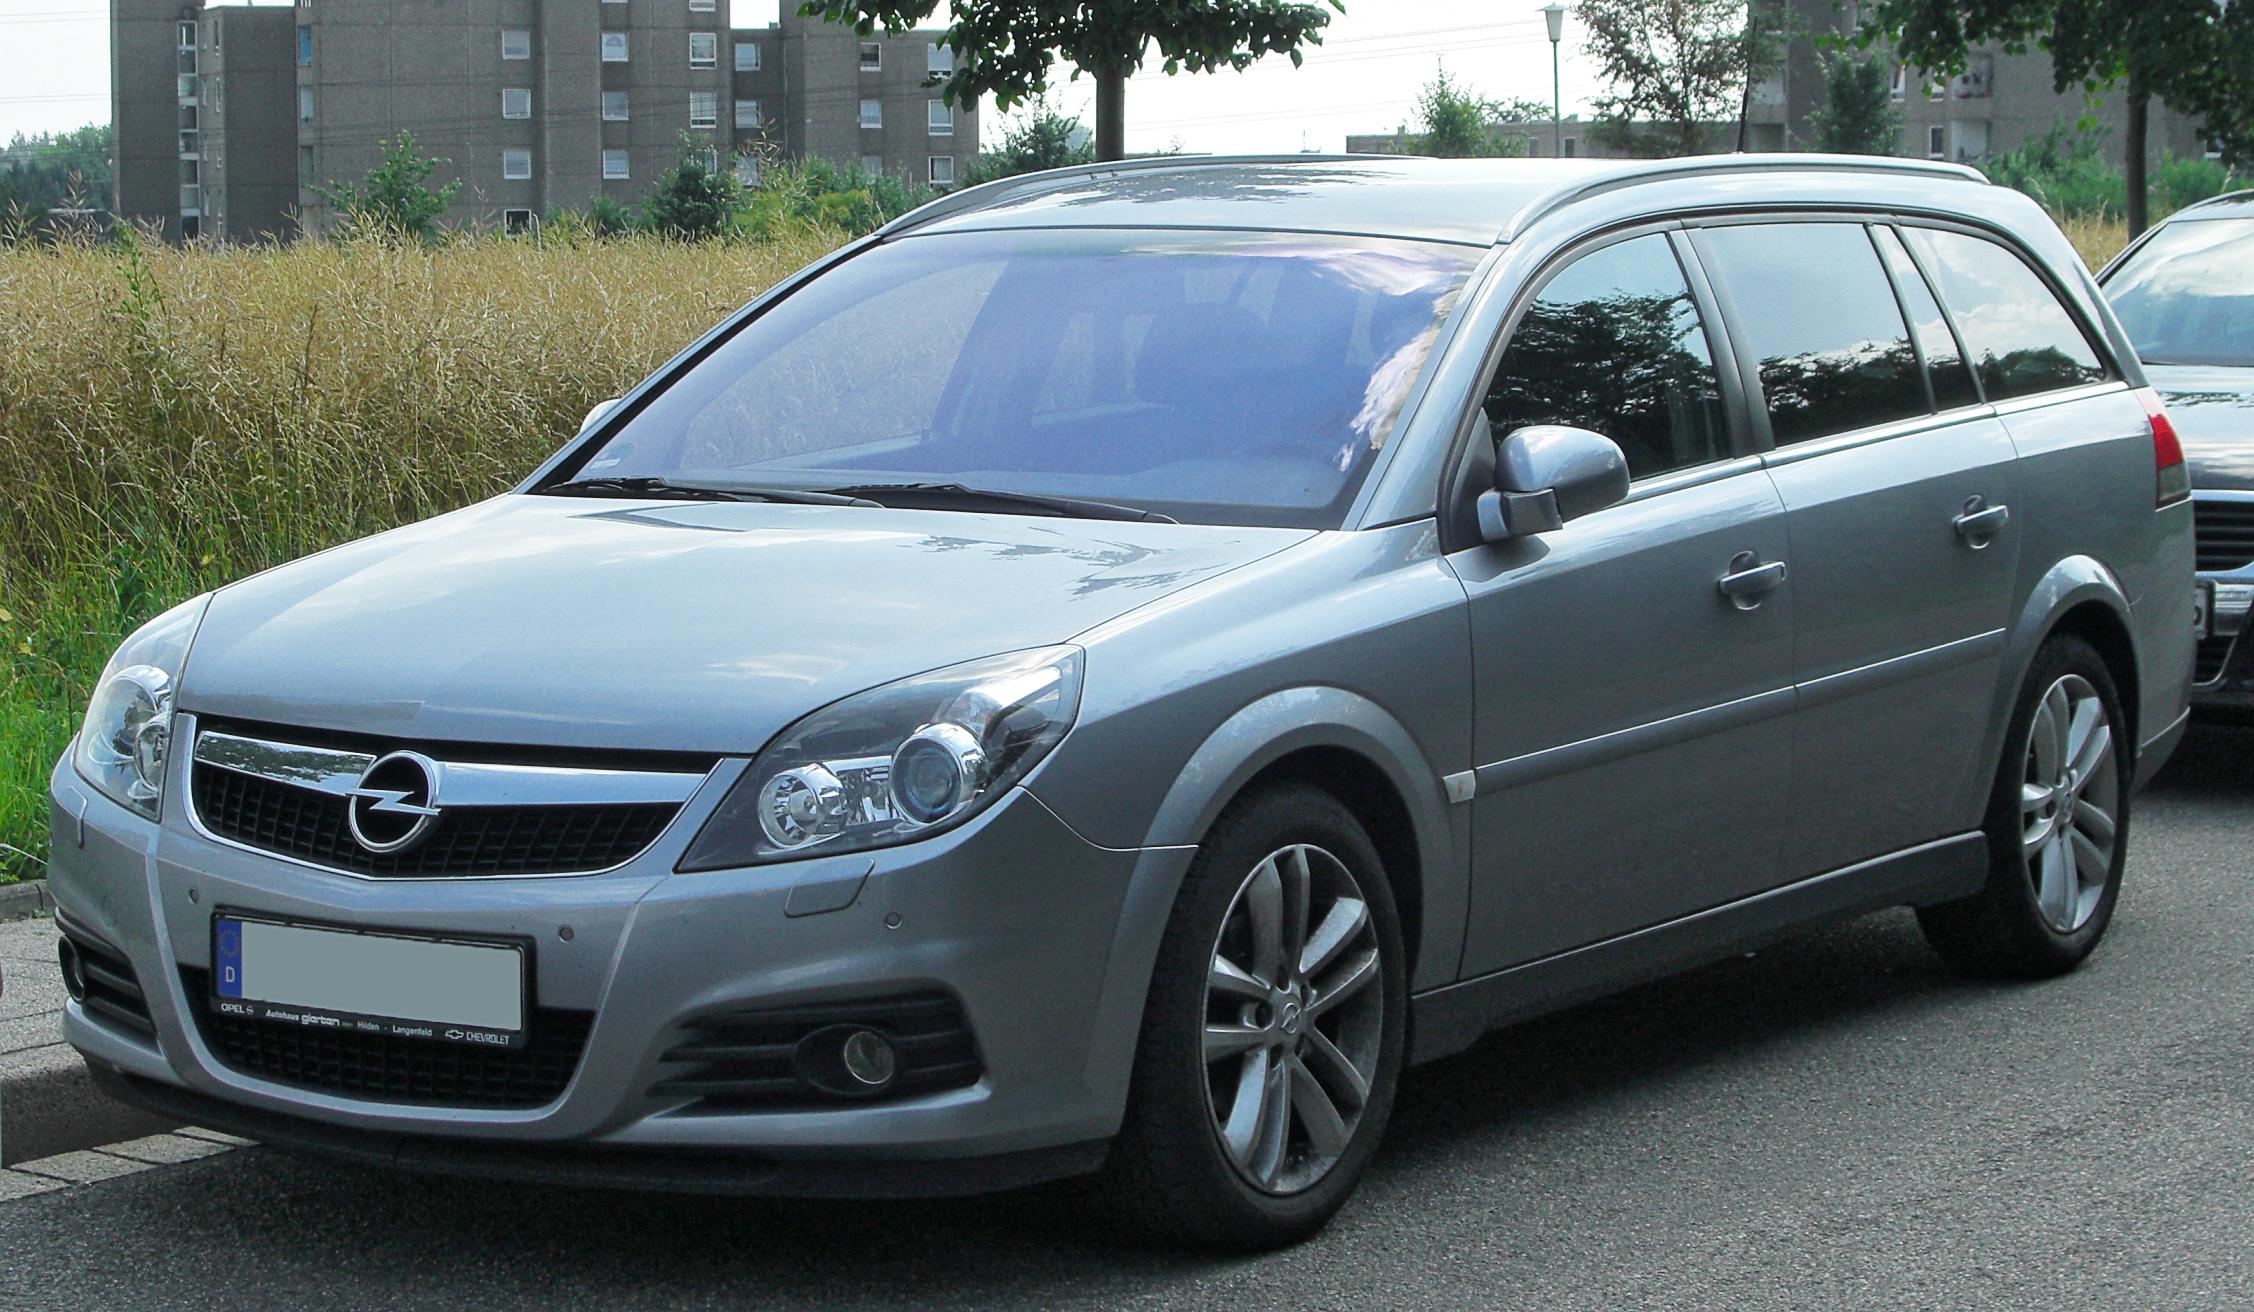 Opel Vectra C Restyling 2005 - 2008 Sedan #3